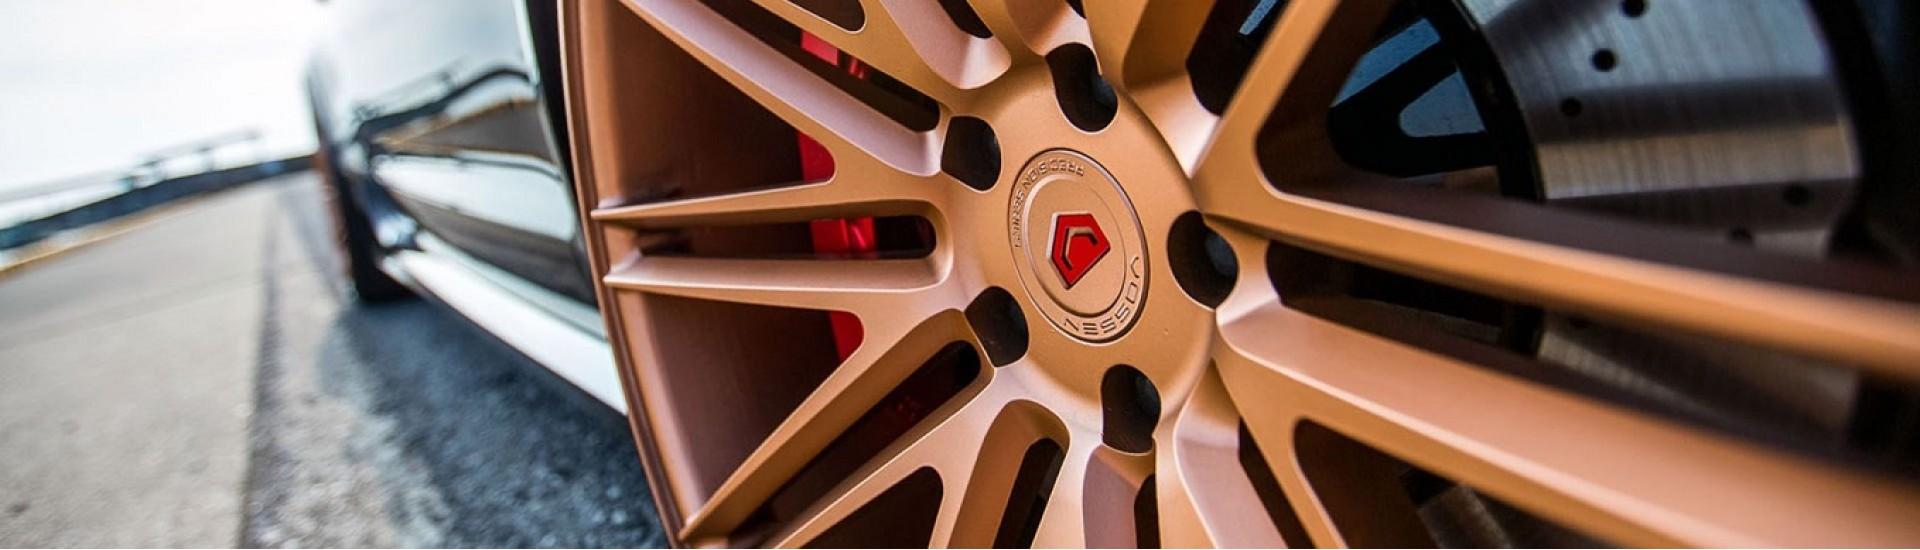 چرخ ، قیمت چرخ ، چرخ فابریک ، custom wheels